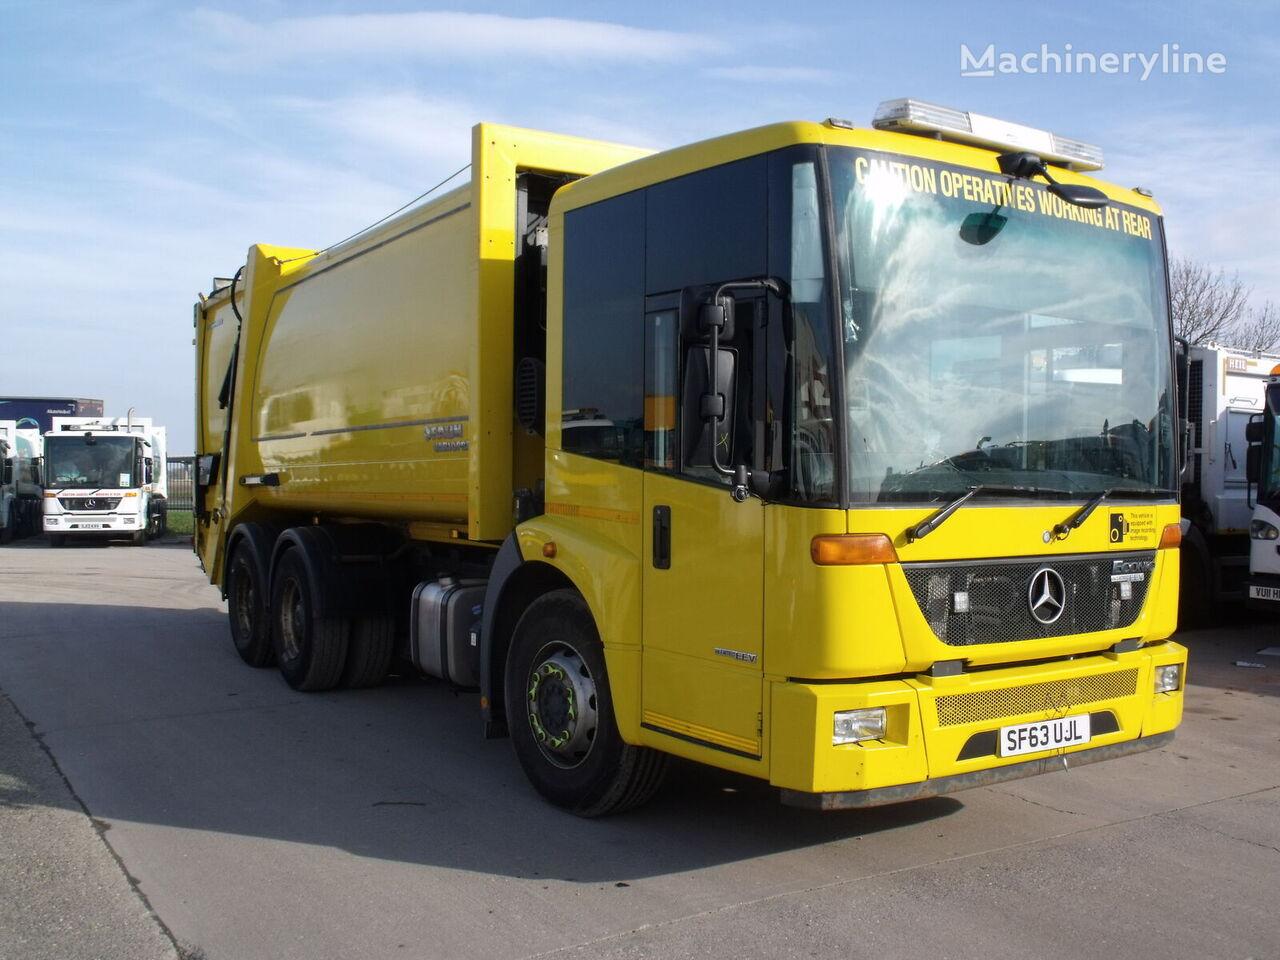 MERCEDES-BENZ Econic garbage truck